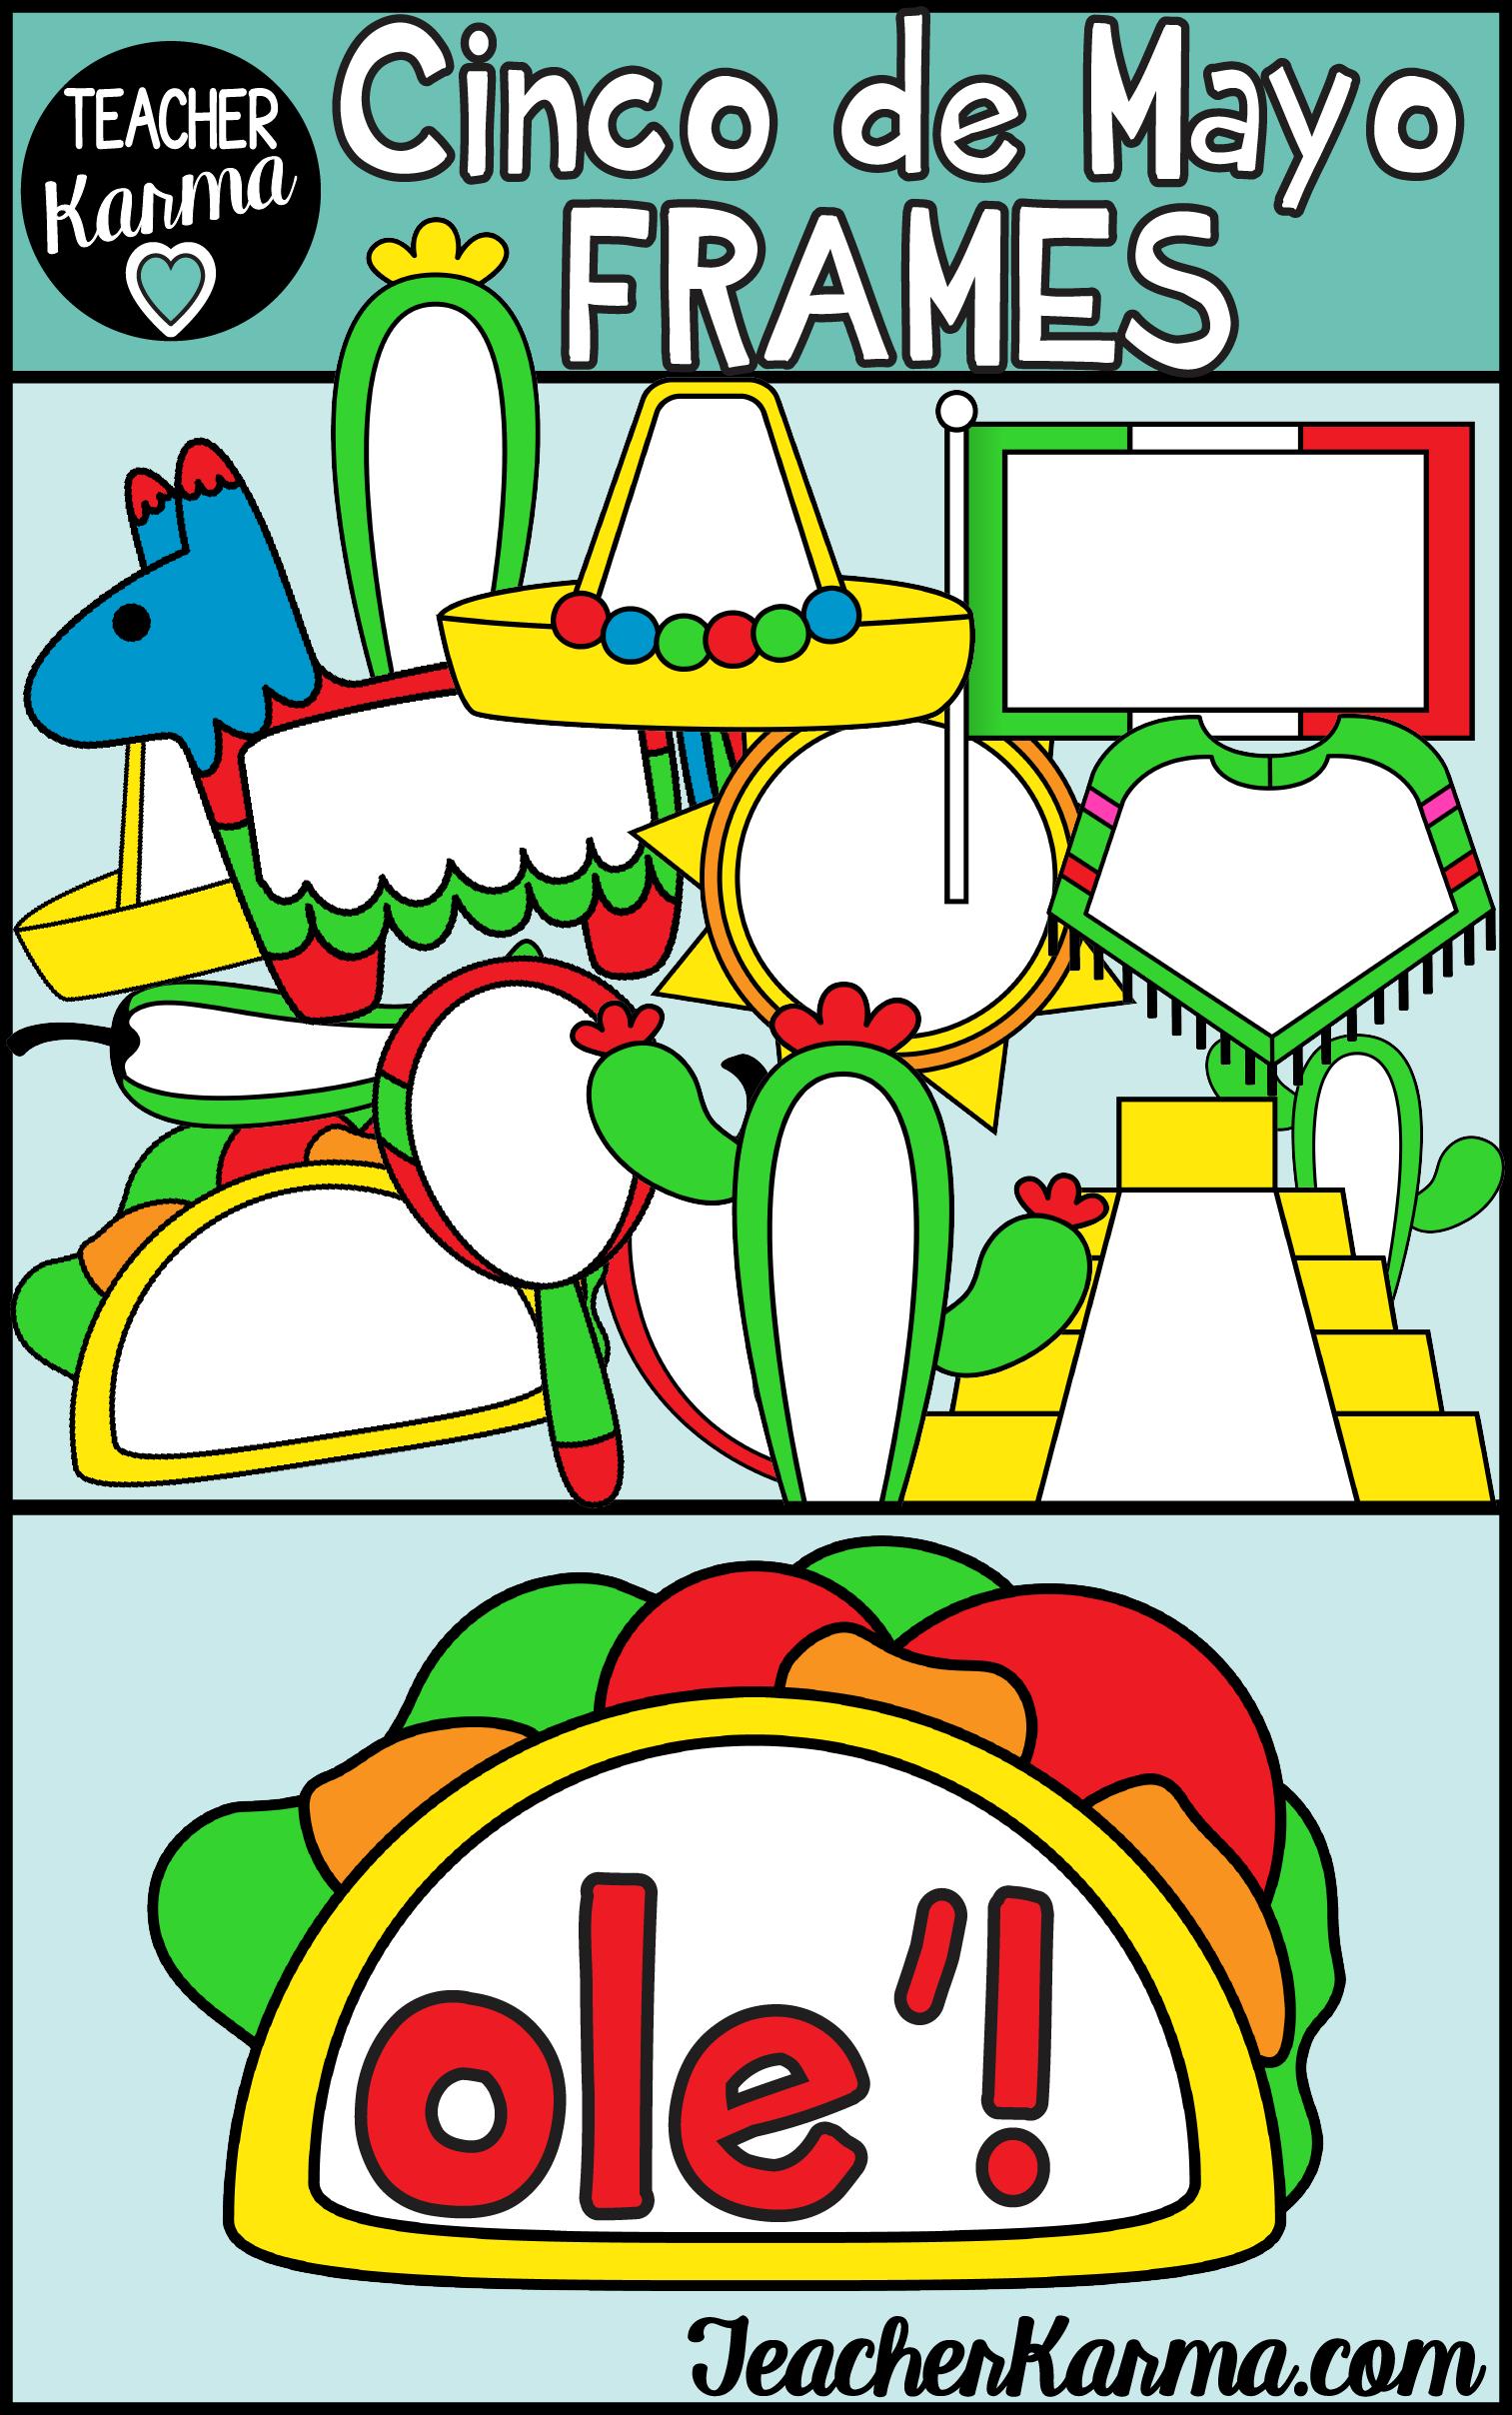 Cinco de Mayo Frames Clipart, Holiday Borders | TK Clipart